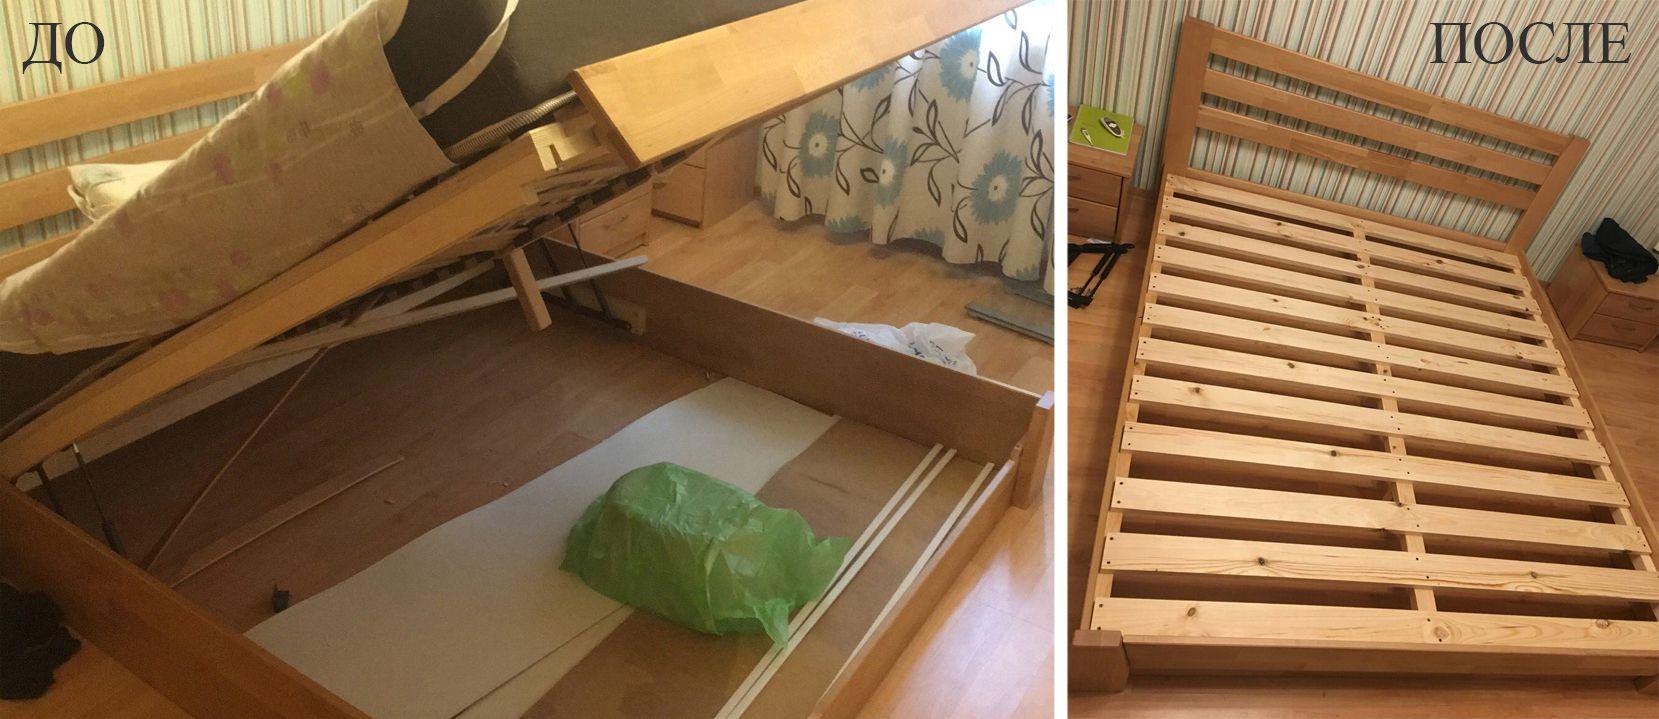 Фото Пример реконструкции каркаса кровати